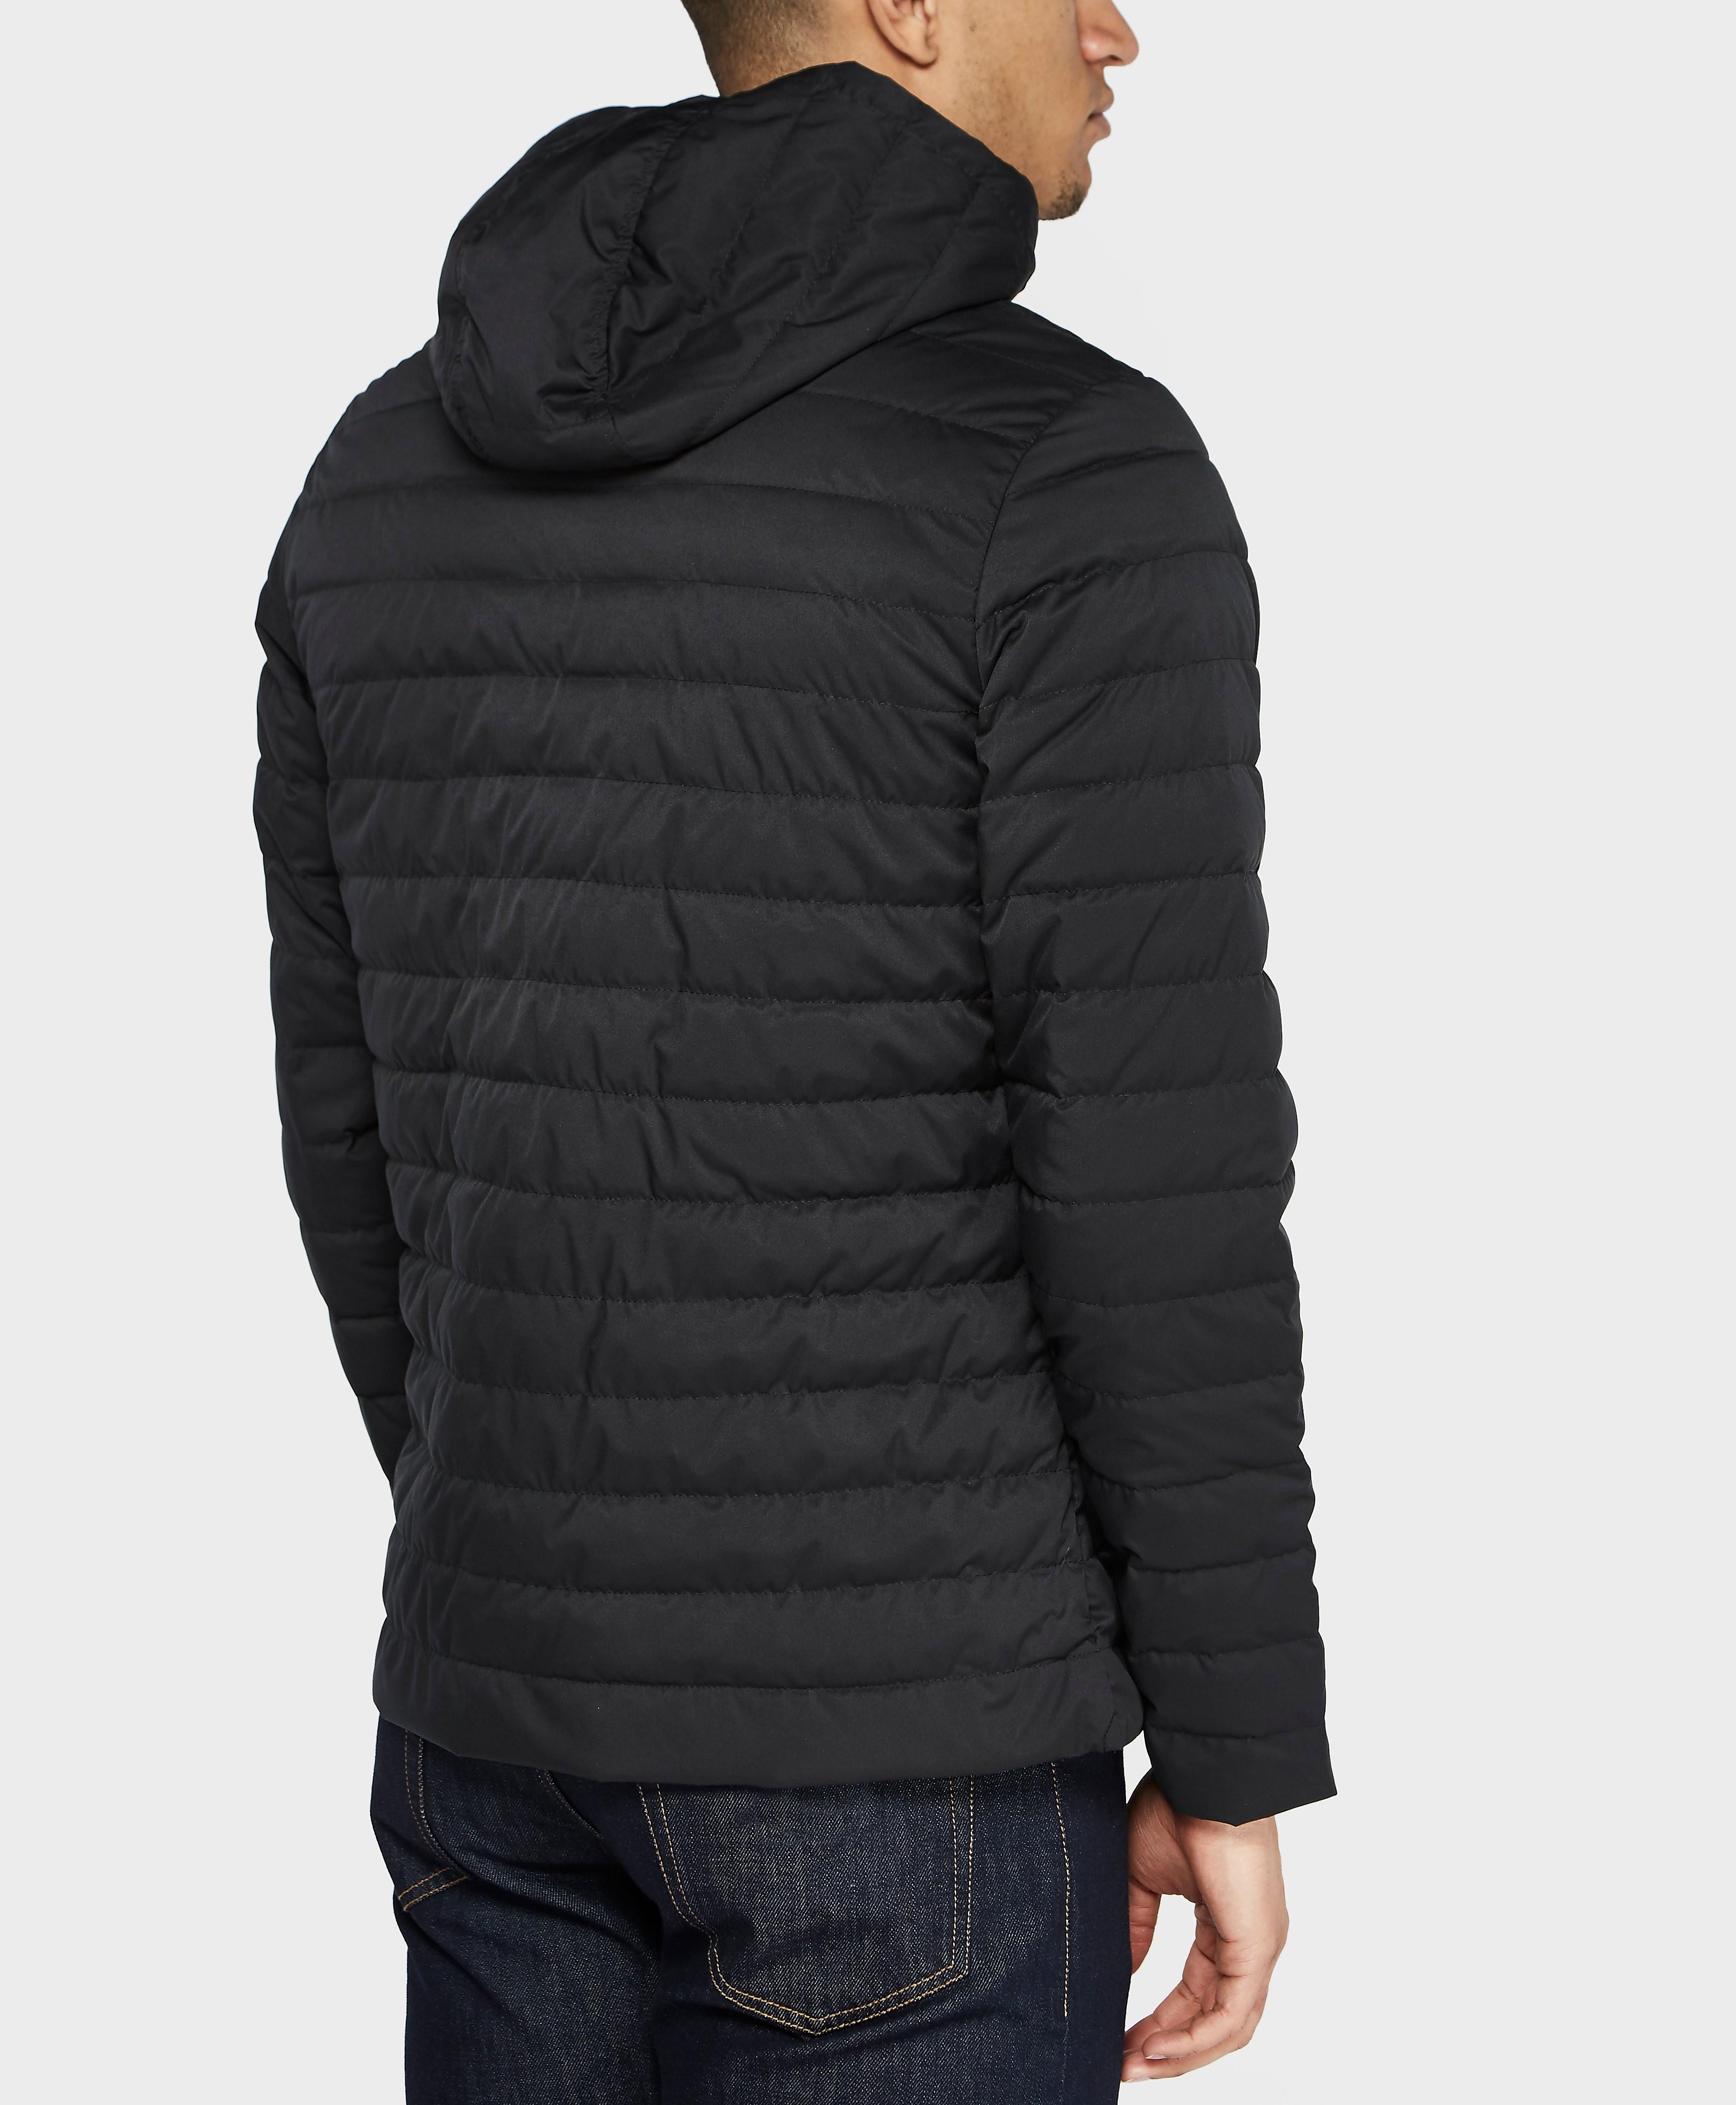 Pyrenex Nordet Jacket